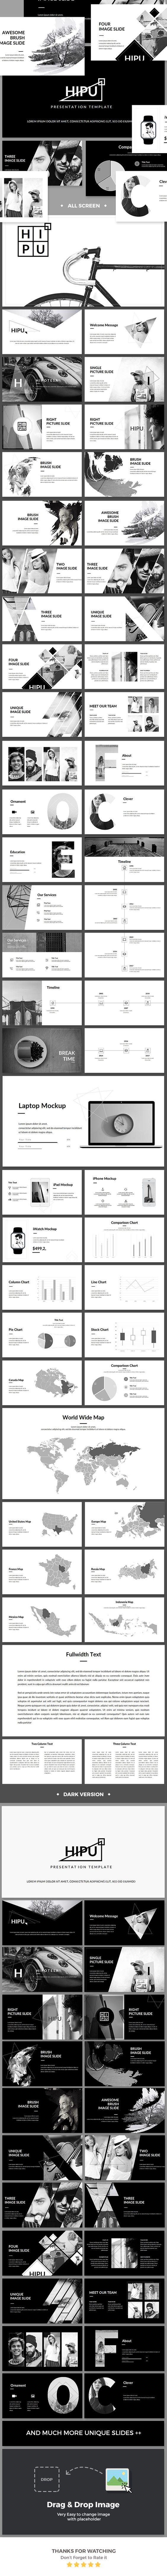 hipu - black white presentation template | powerpoint themes, Presentation templates